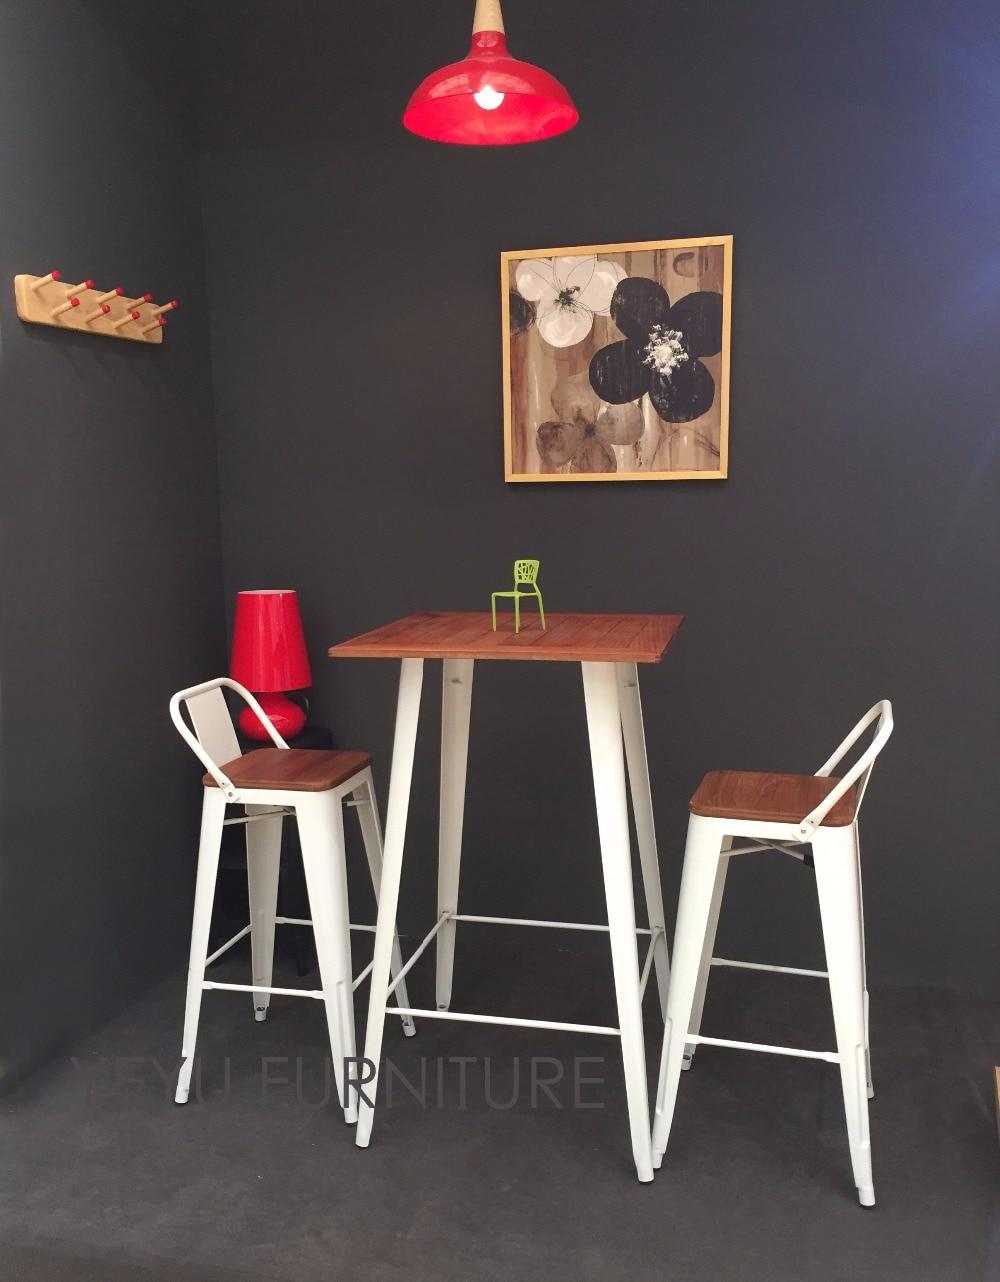 Minimalist Modern Design Low Back Outdoor Metal Steel Bar Stool With Teak Wood Seat Commercial Bar Furniture Set Bar Table Steel Bar Stools Bar Stoolbar Stools Design Aliexpress